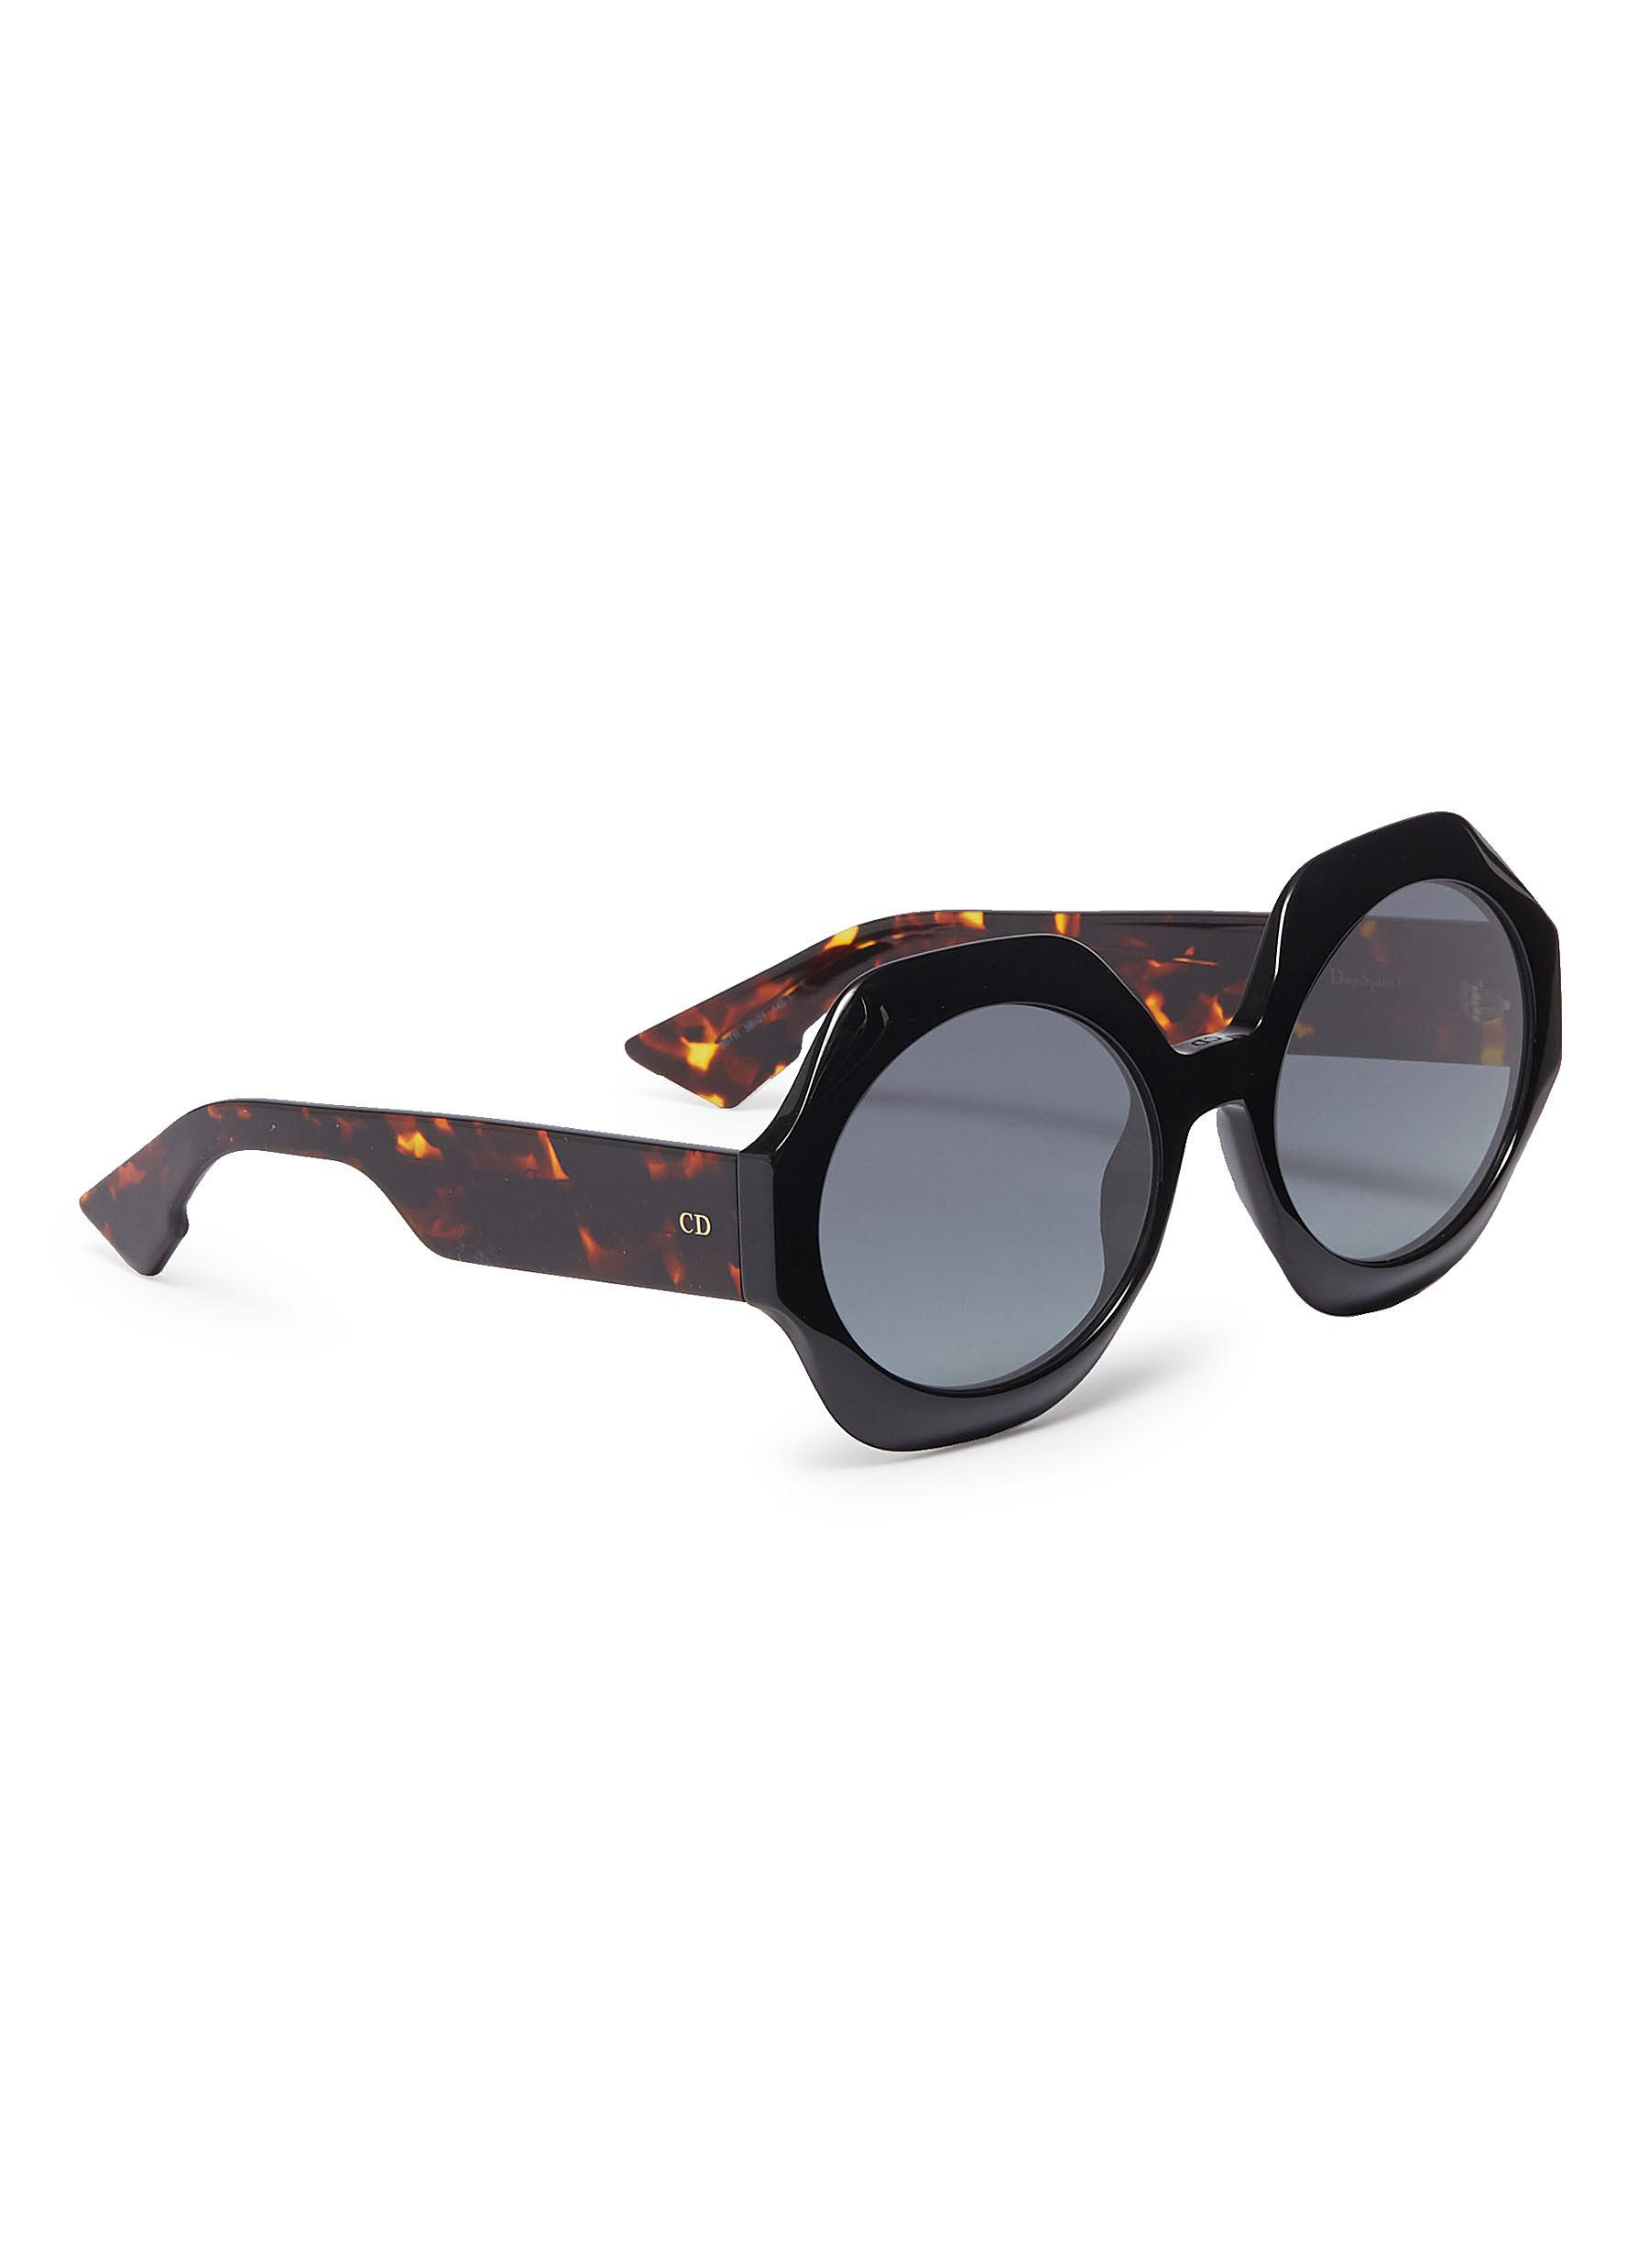 063f58a92c Dior - Multicolor   Spirit 1  Octagon Frame Acetate Sunglasses for Men -  Lyst. View fullscreen